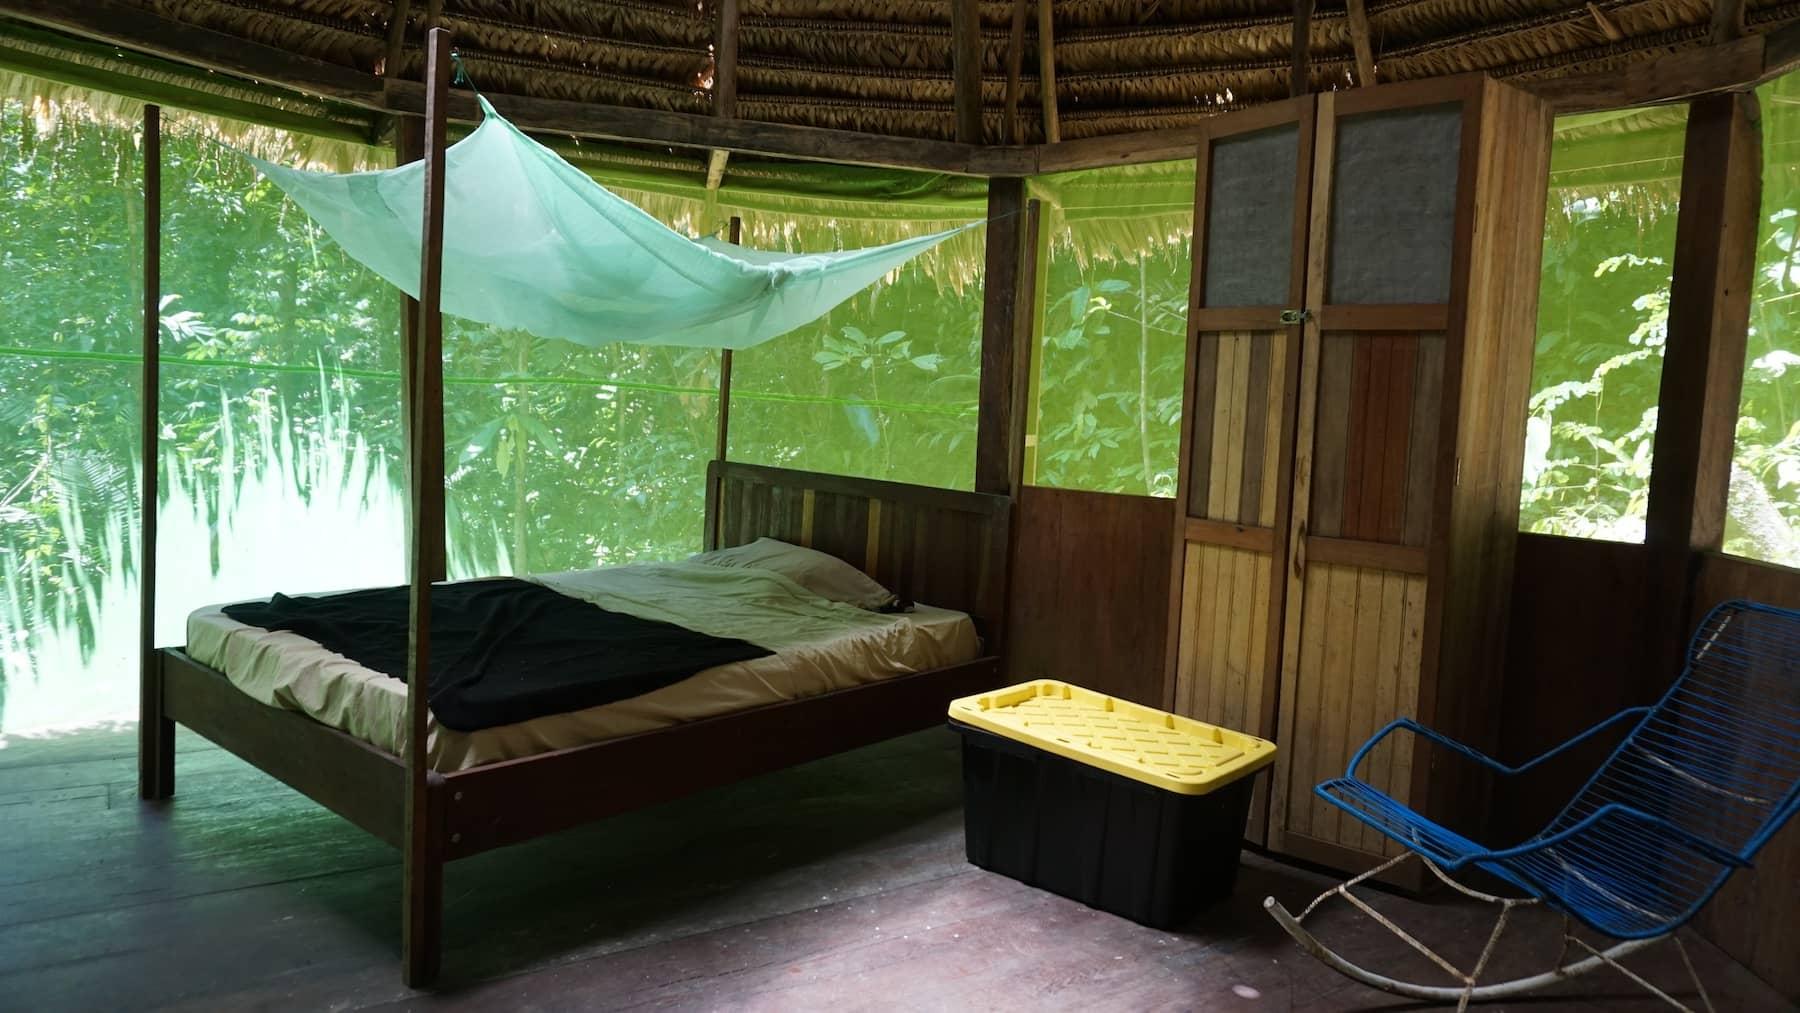 Photos of Ayahuasca Retreats at Rainforest Healing Center in